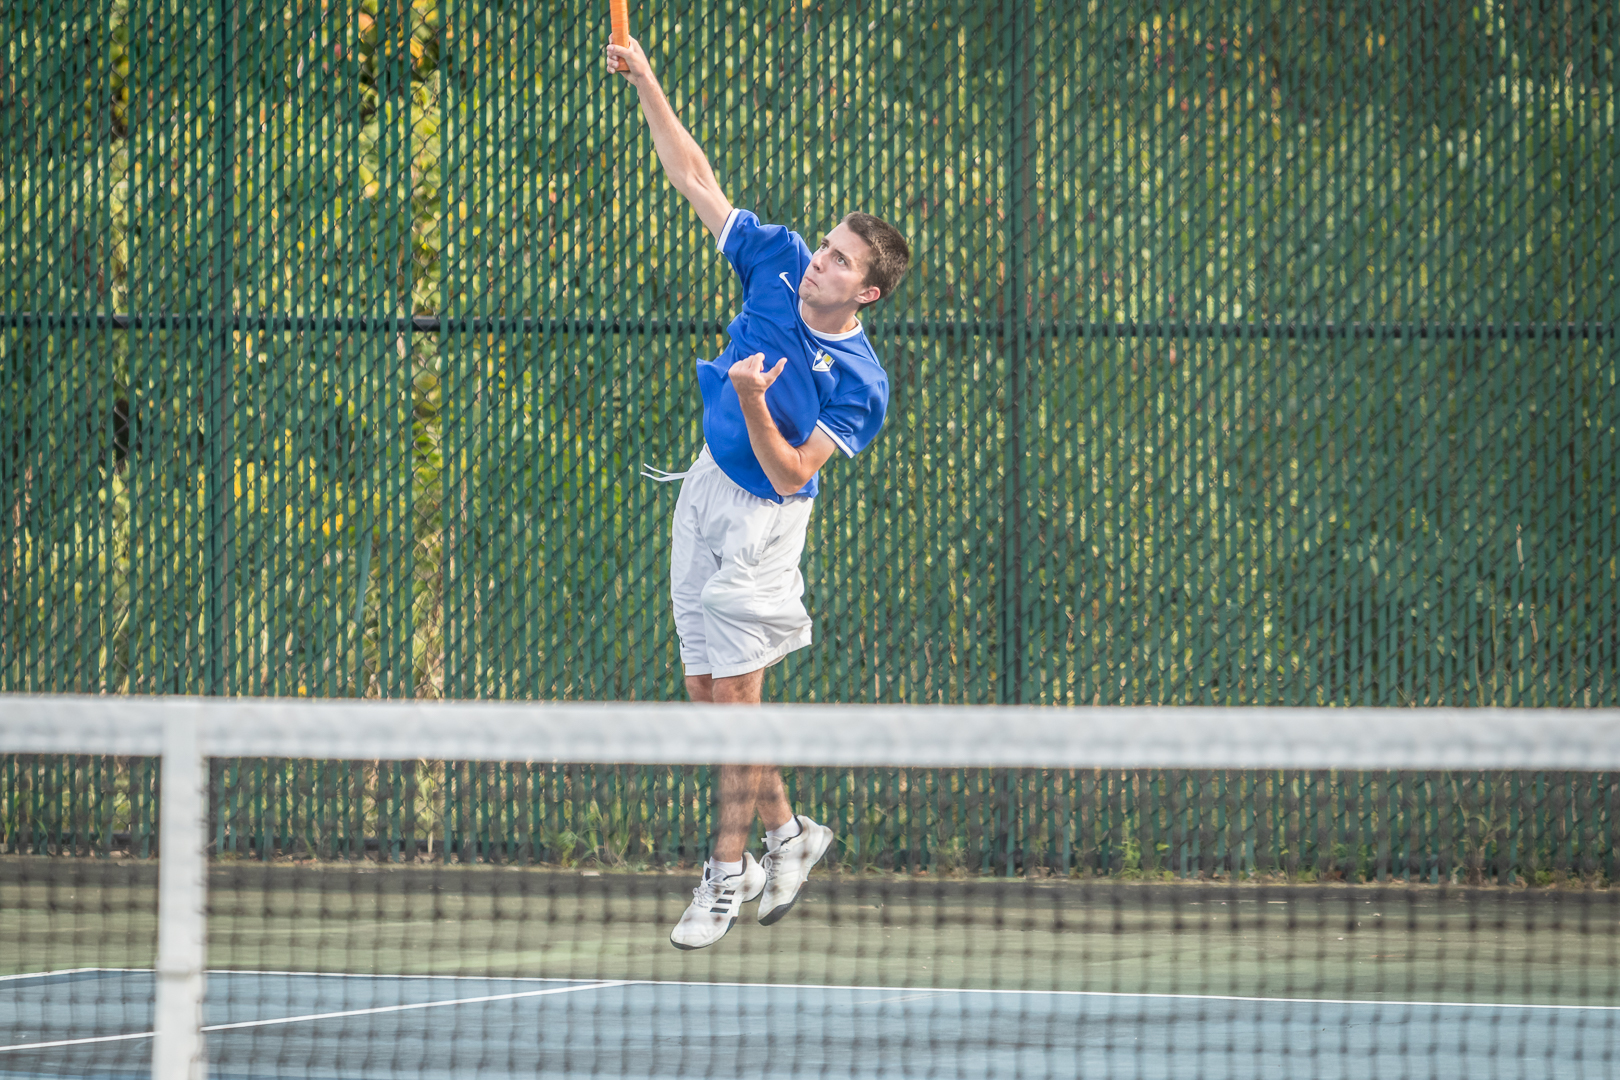 Marian-Boys-Tennis-1703.jpg